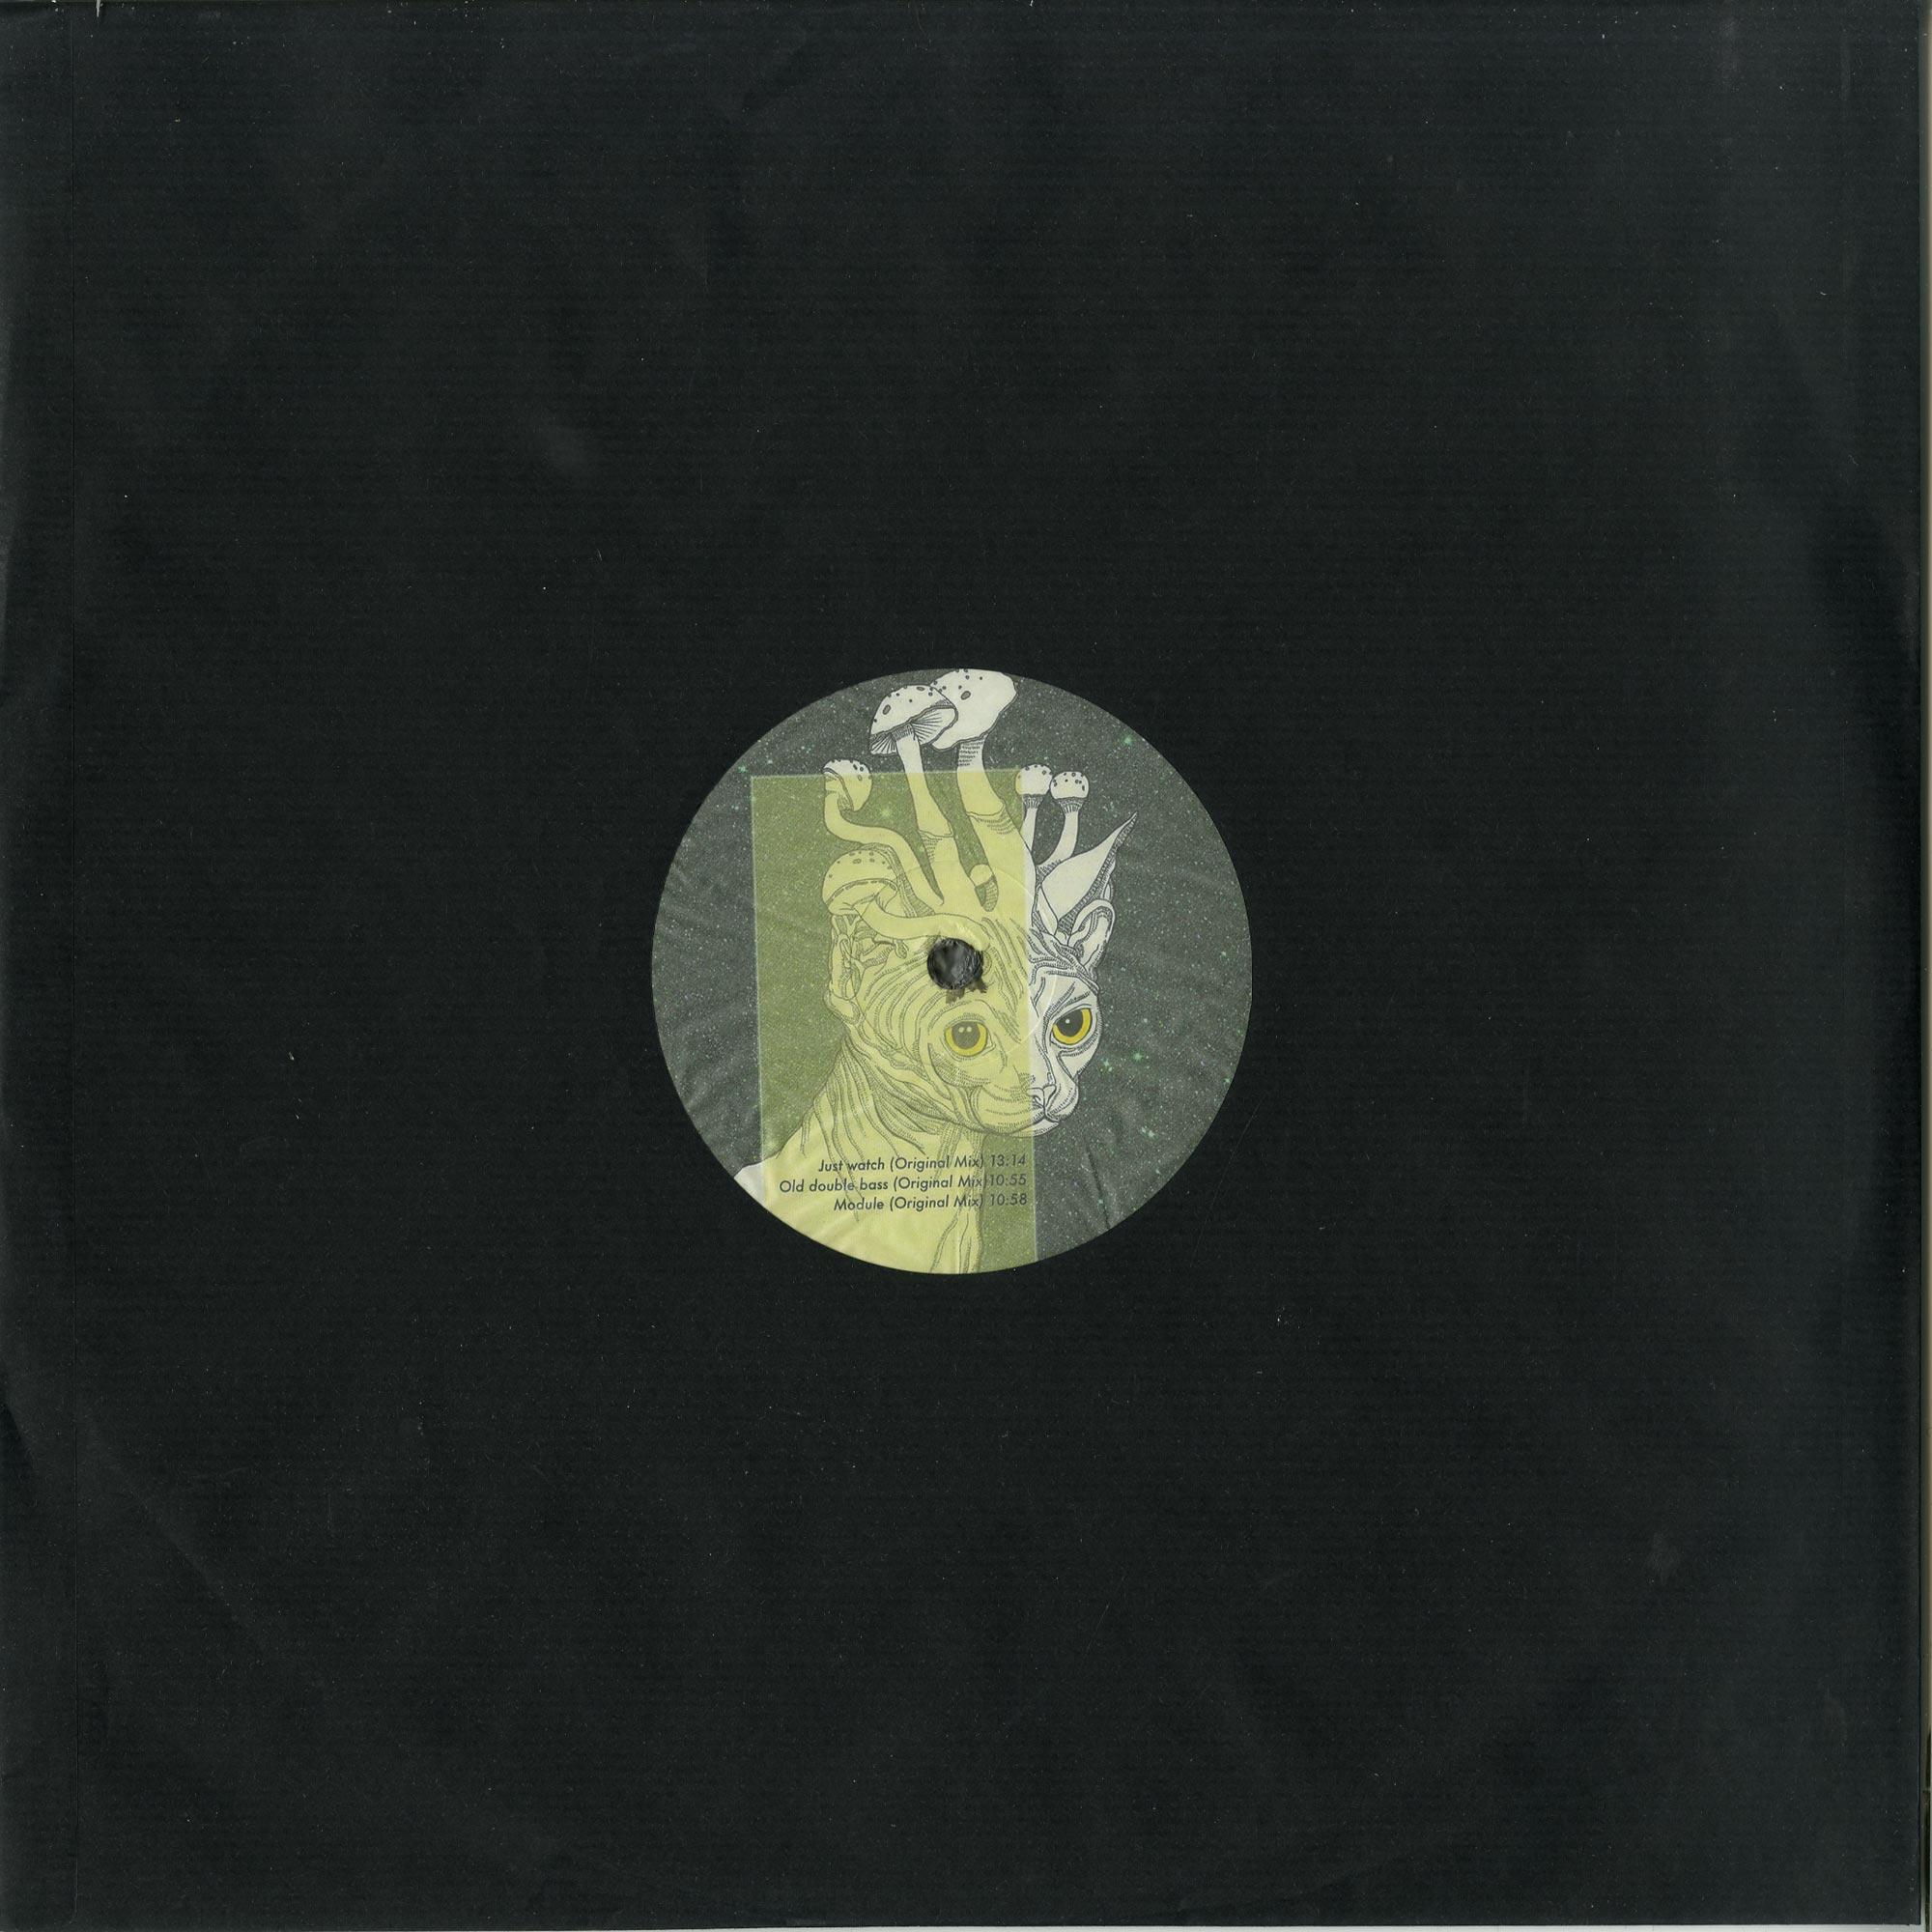 George Bell - GATEHOOPER EP